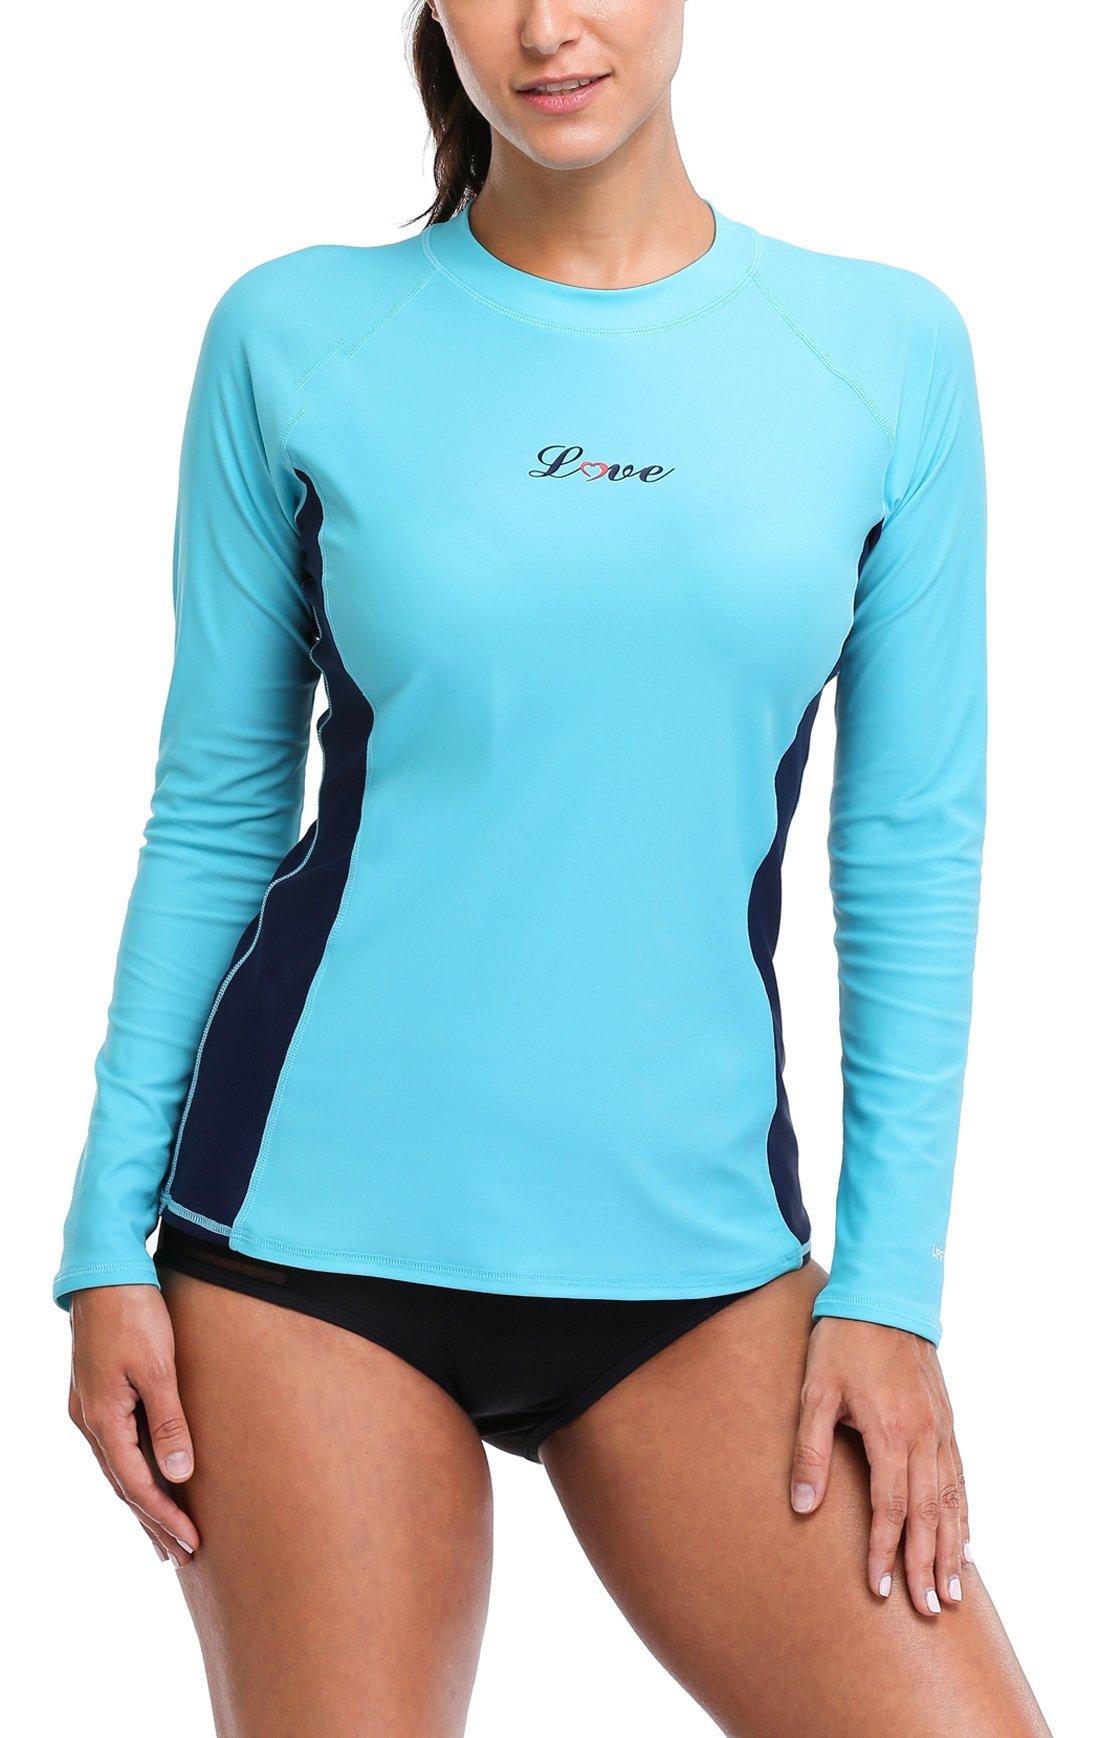 ALove Rash Guard for Women UV Shirts for Women Long Sleeves Rashguard Top XXL